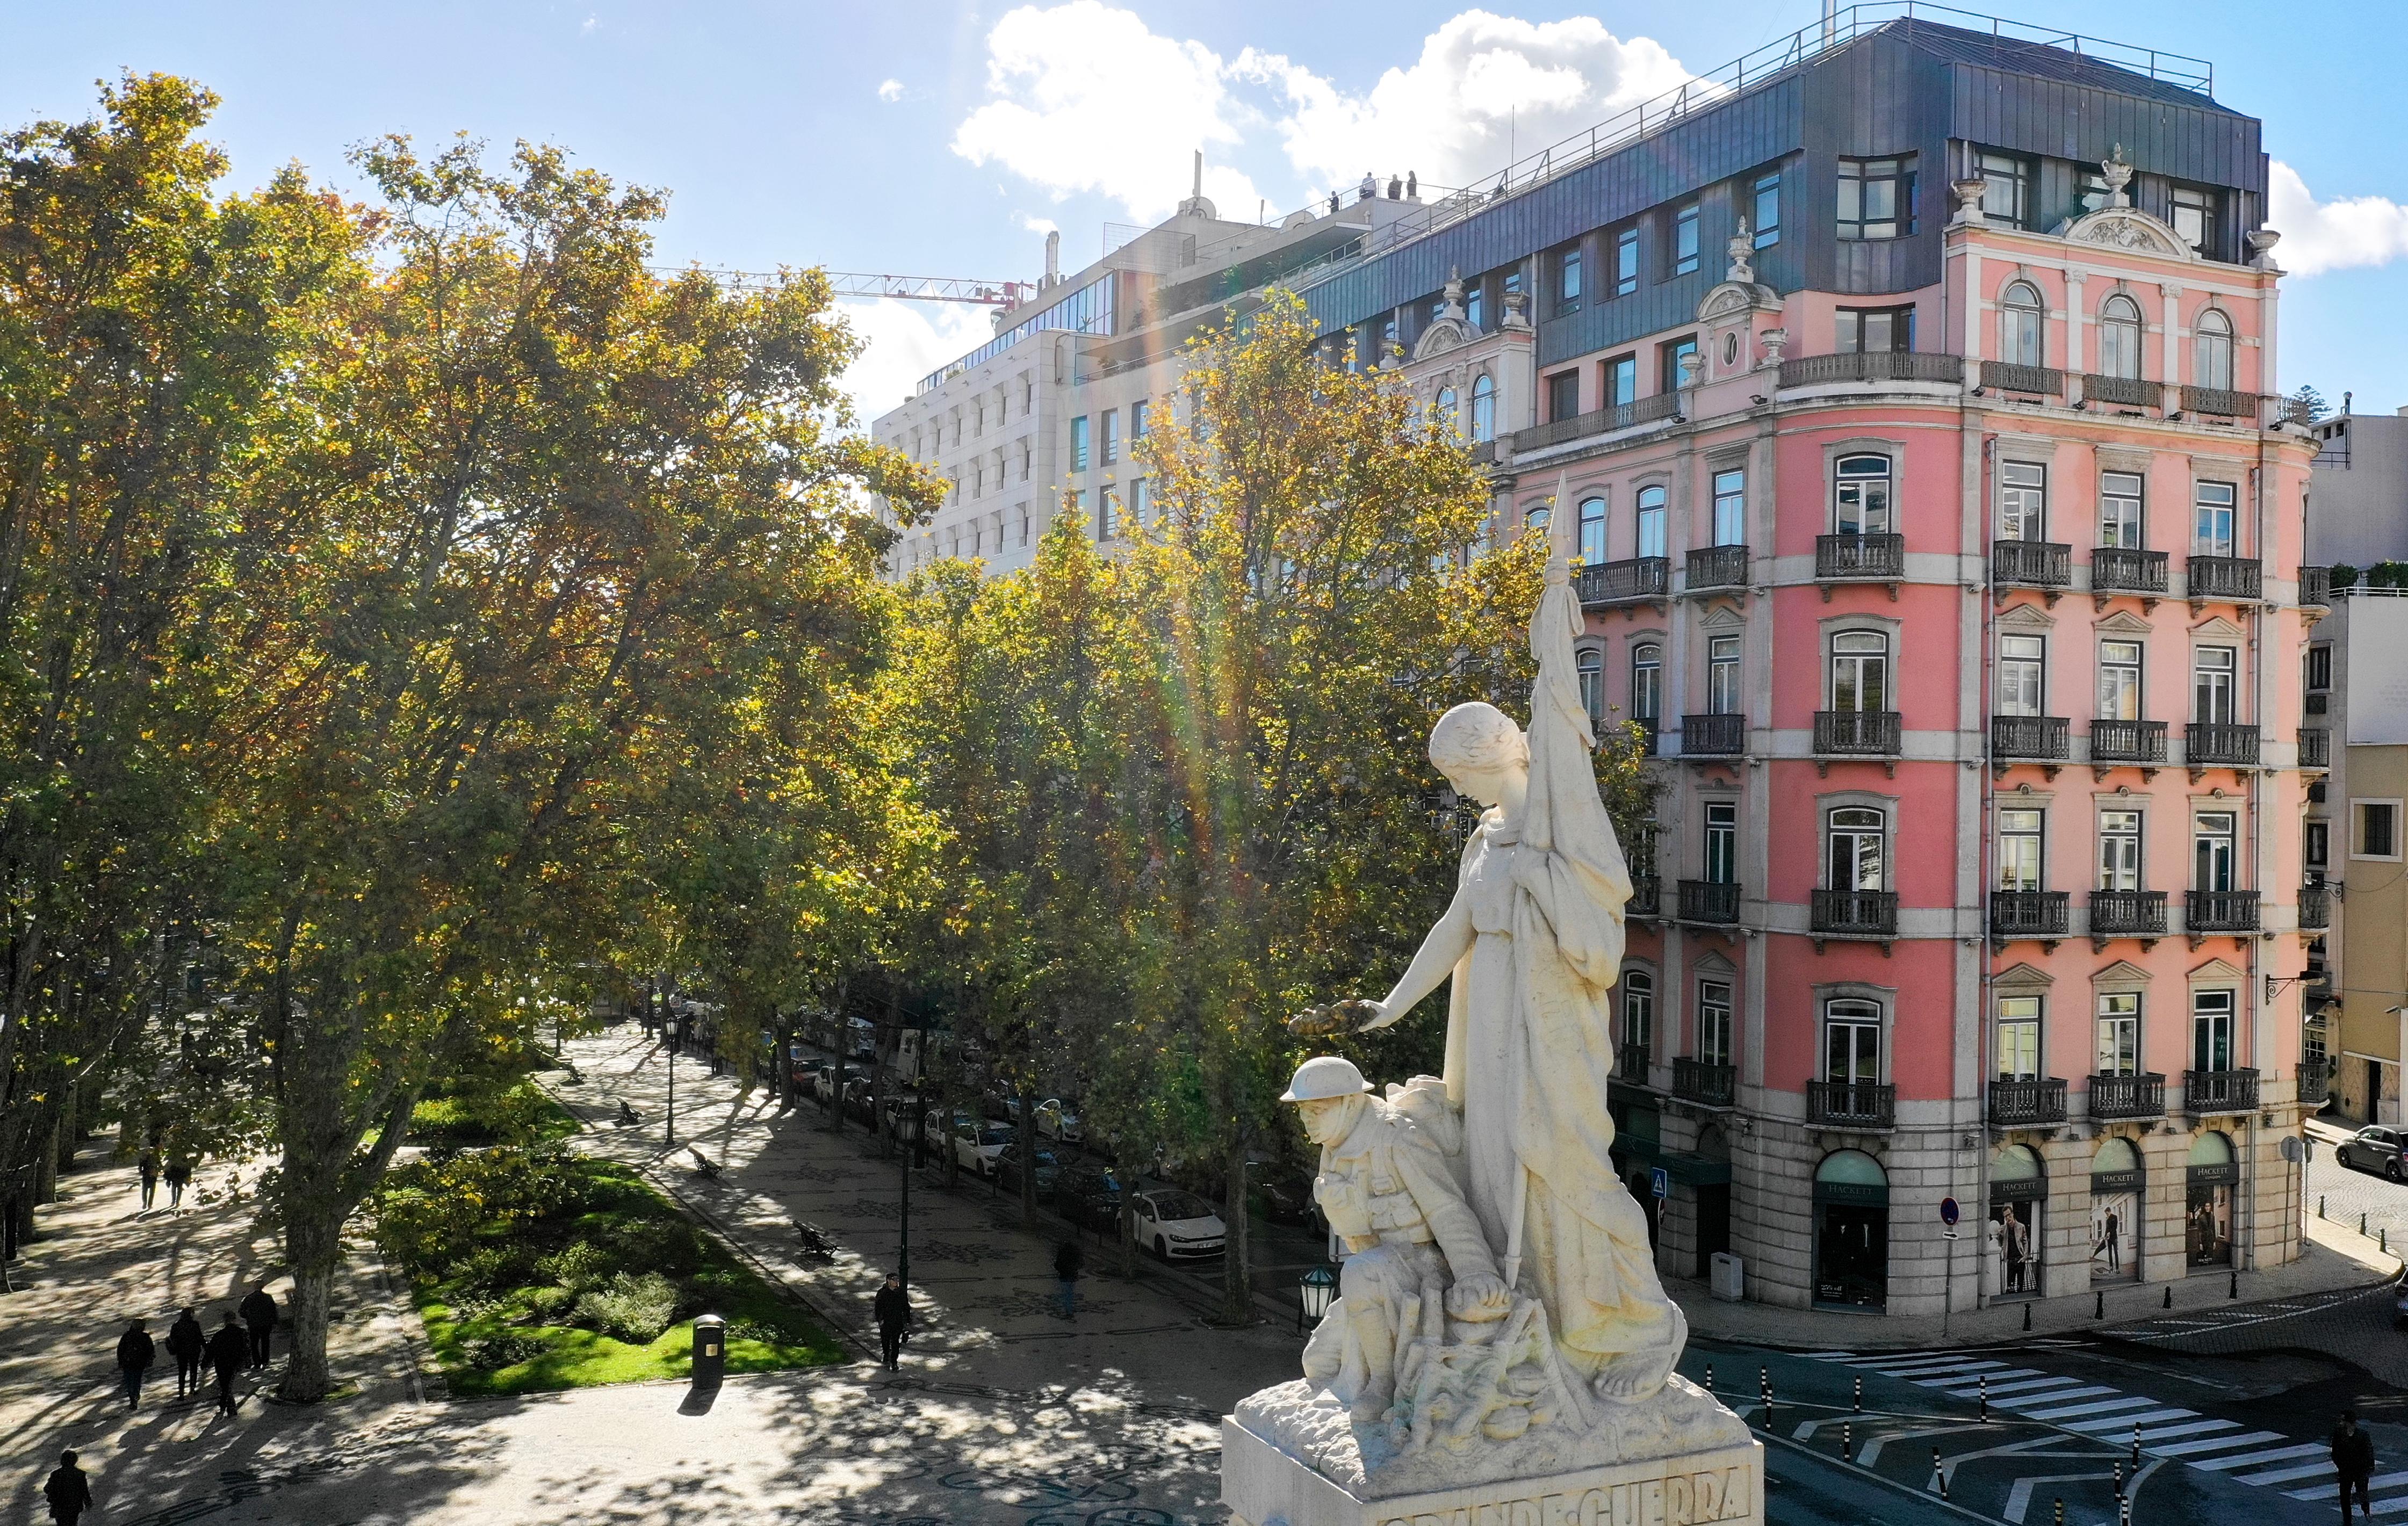 A fachada do edifício. o número 131 da Avenida da Liberdade / Bacardi-Martini Portugal